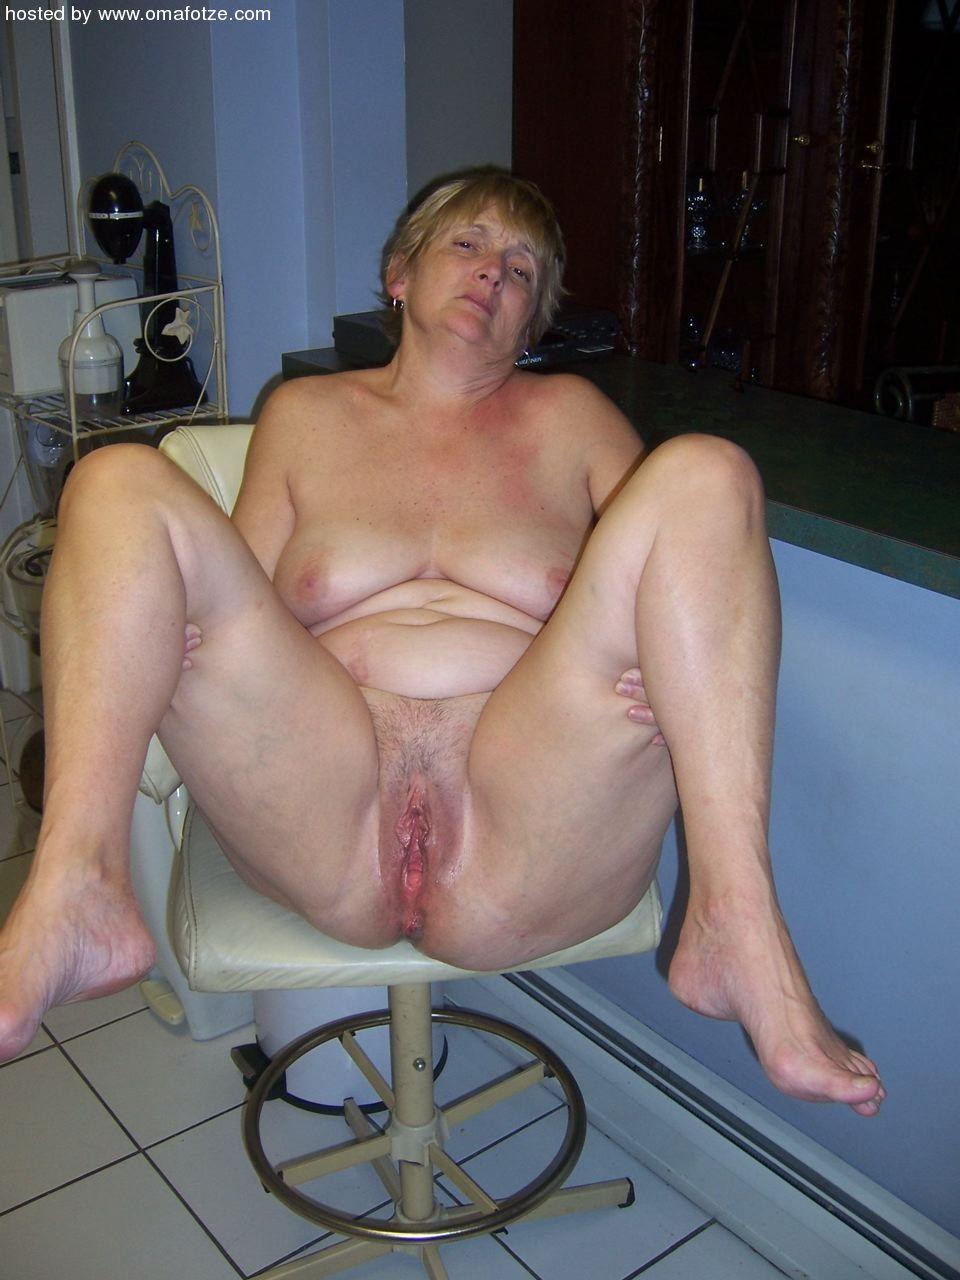 Oma mature